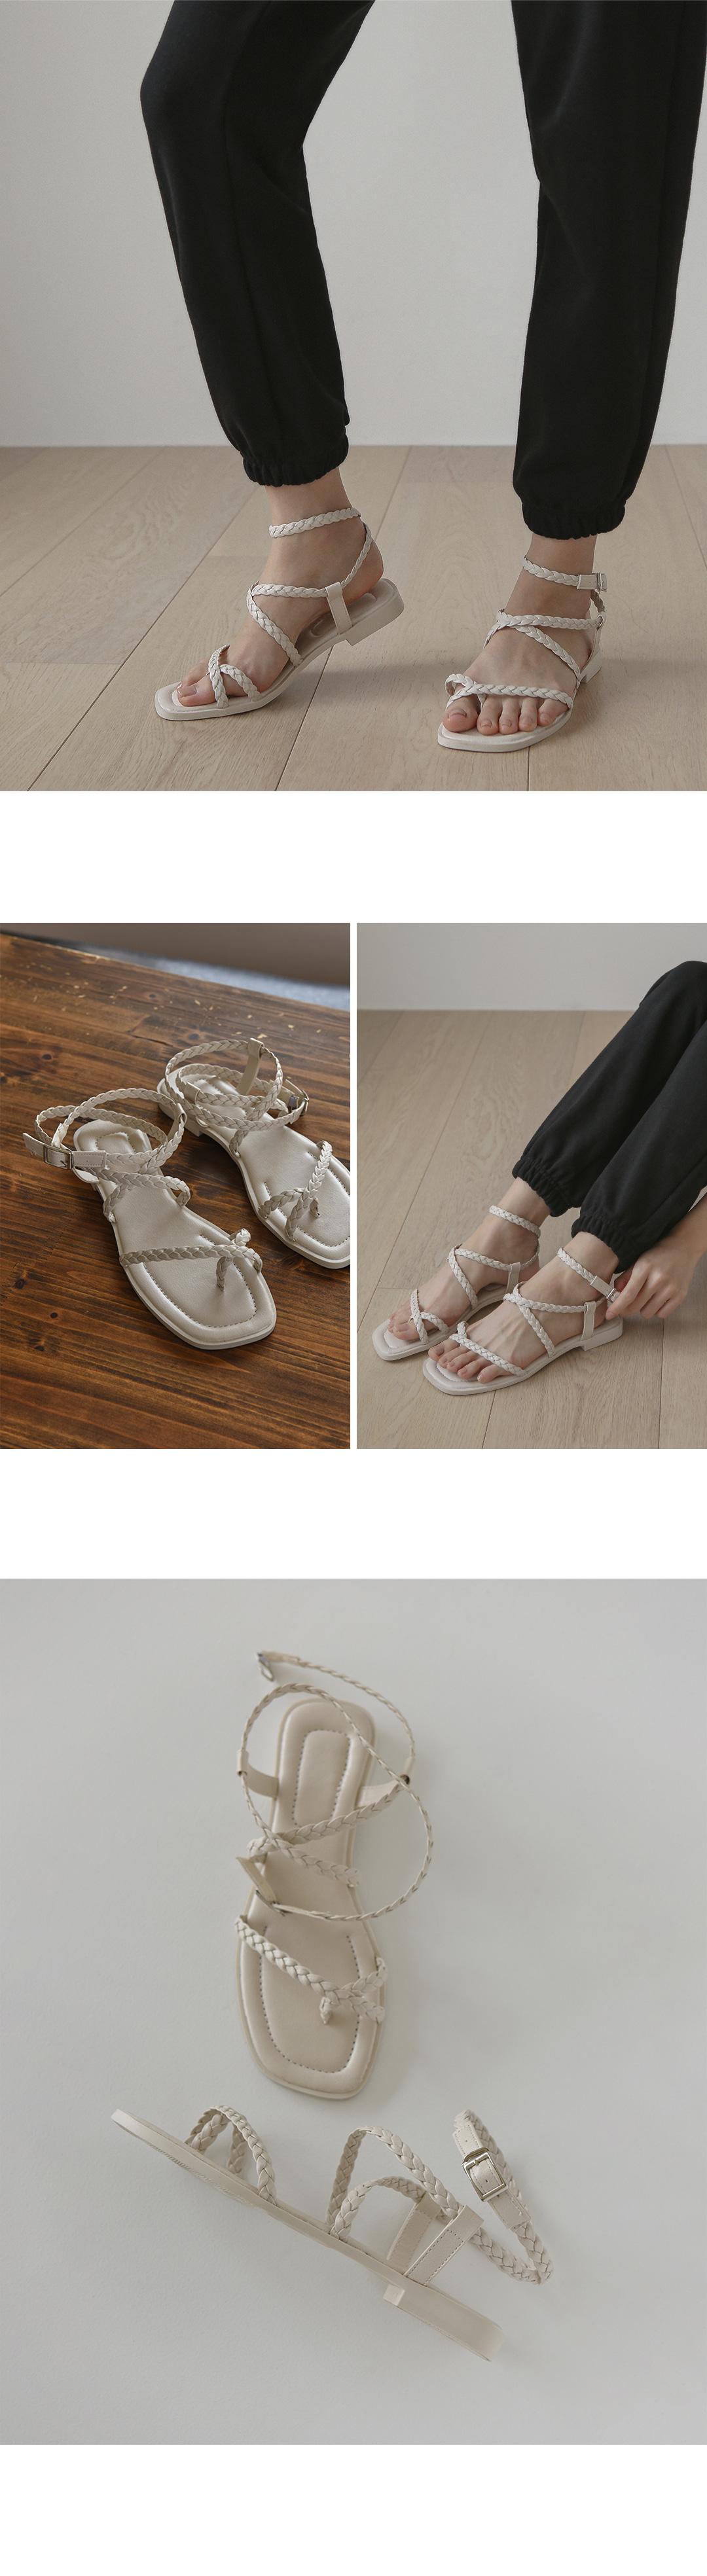 nixie twist strap toring sandals SDLTS2d135